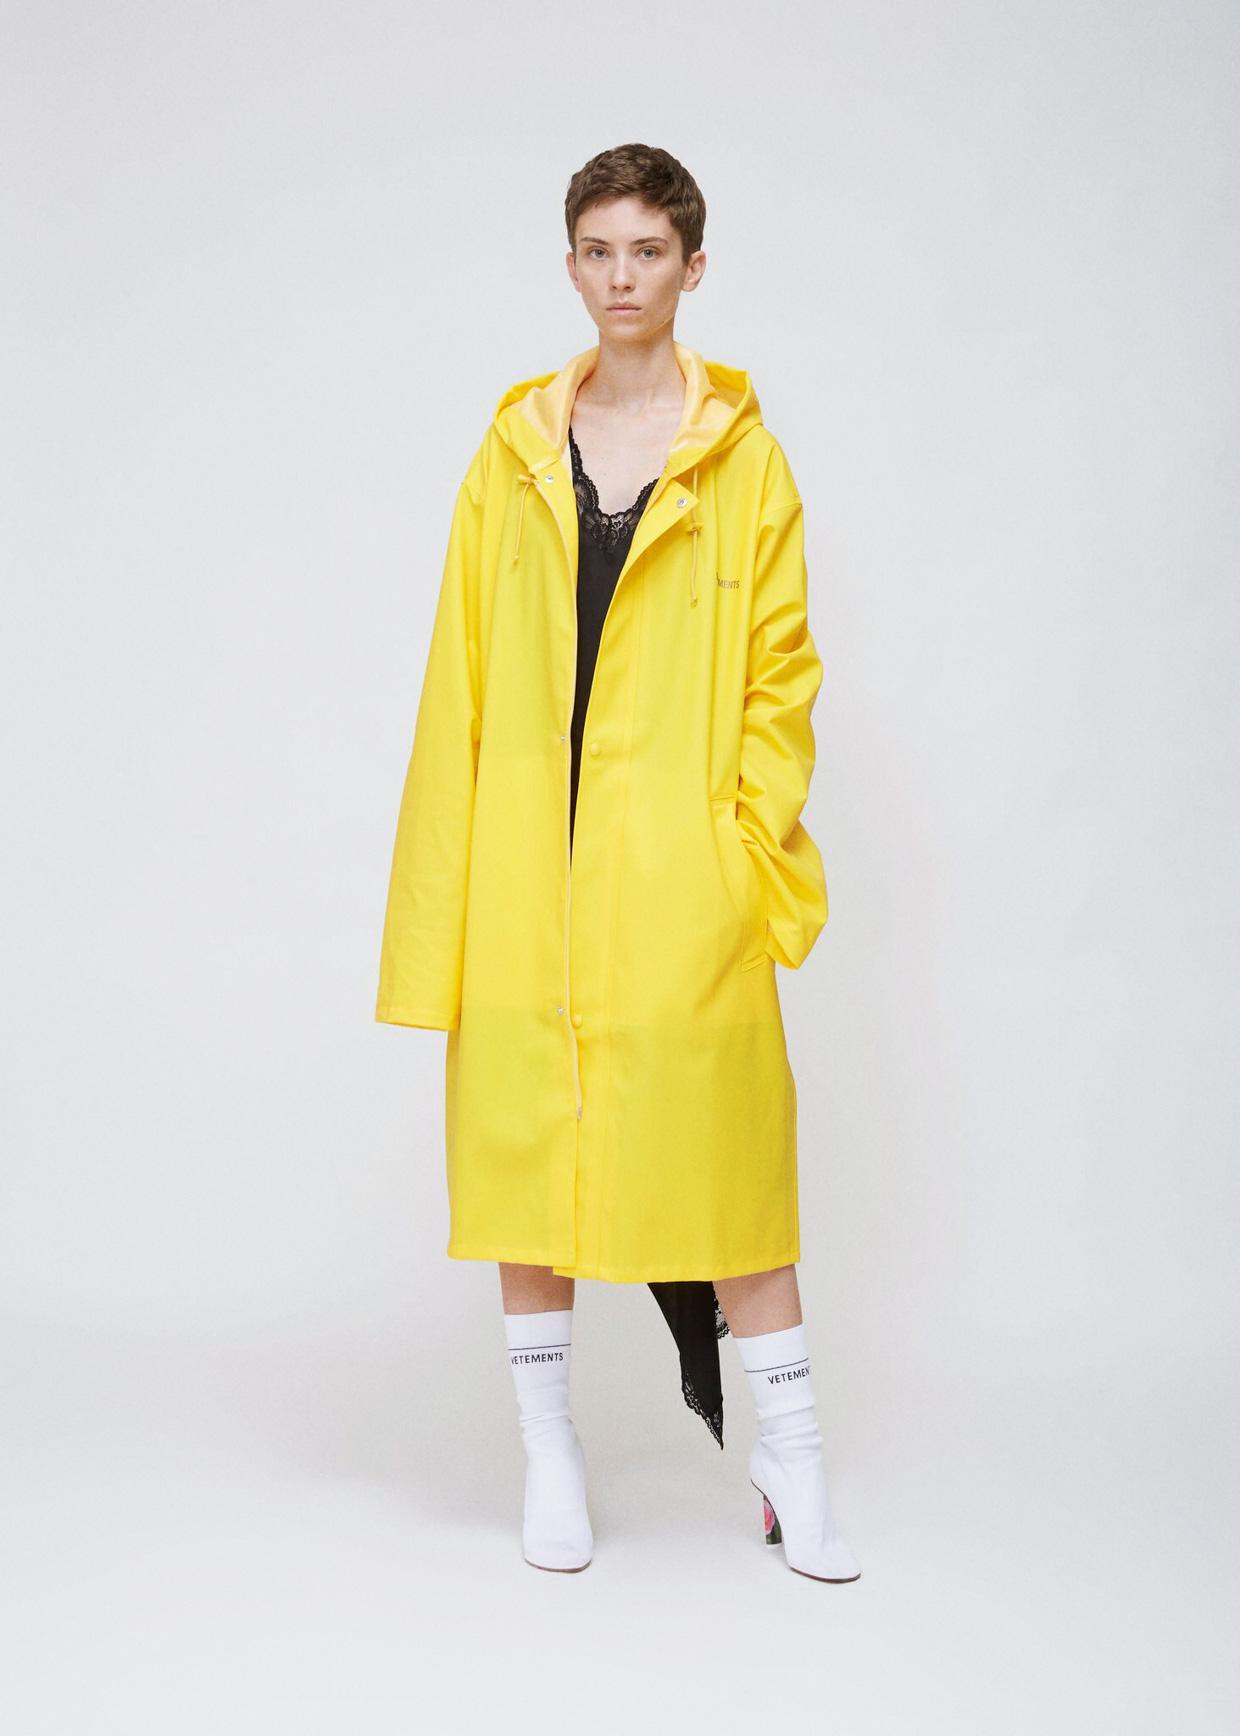 Vetements Yellow Raincoat In Yellow Lyst